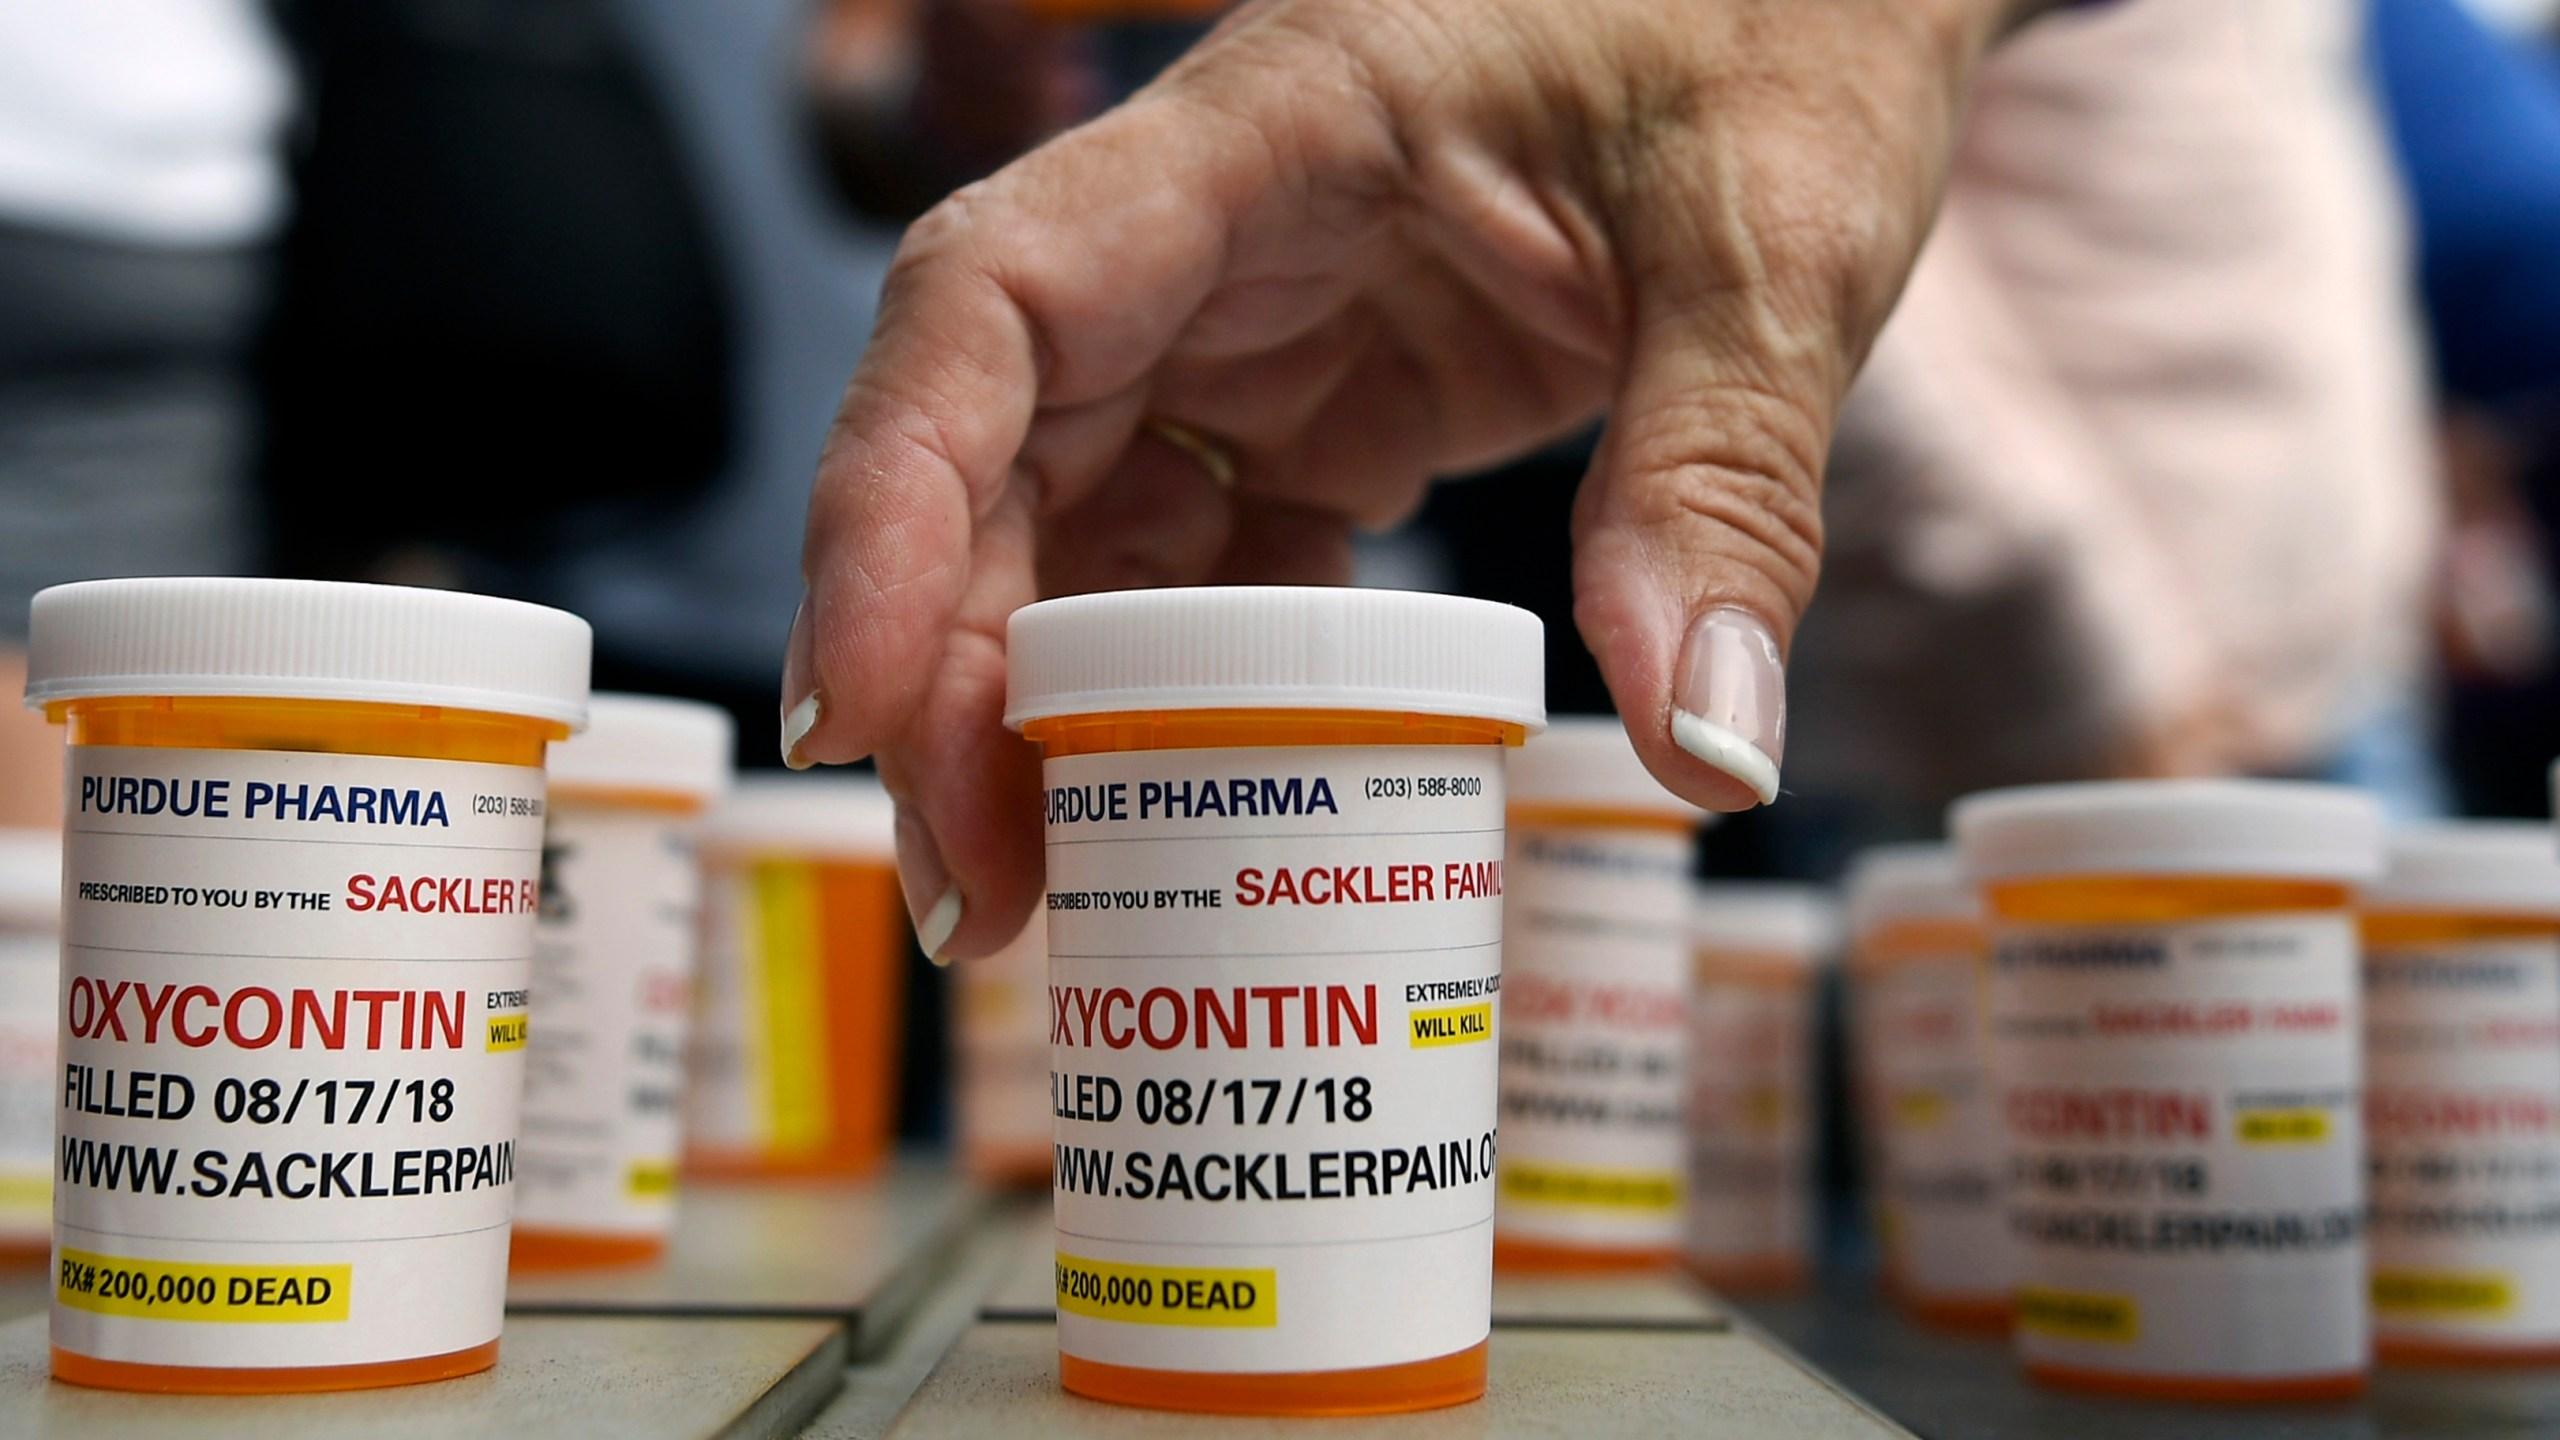 Opioid_Lawsuit_New_York_08522-159532.jpg31855045